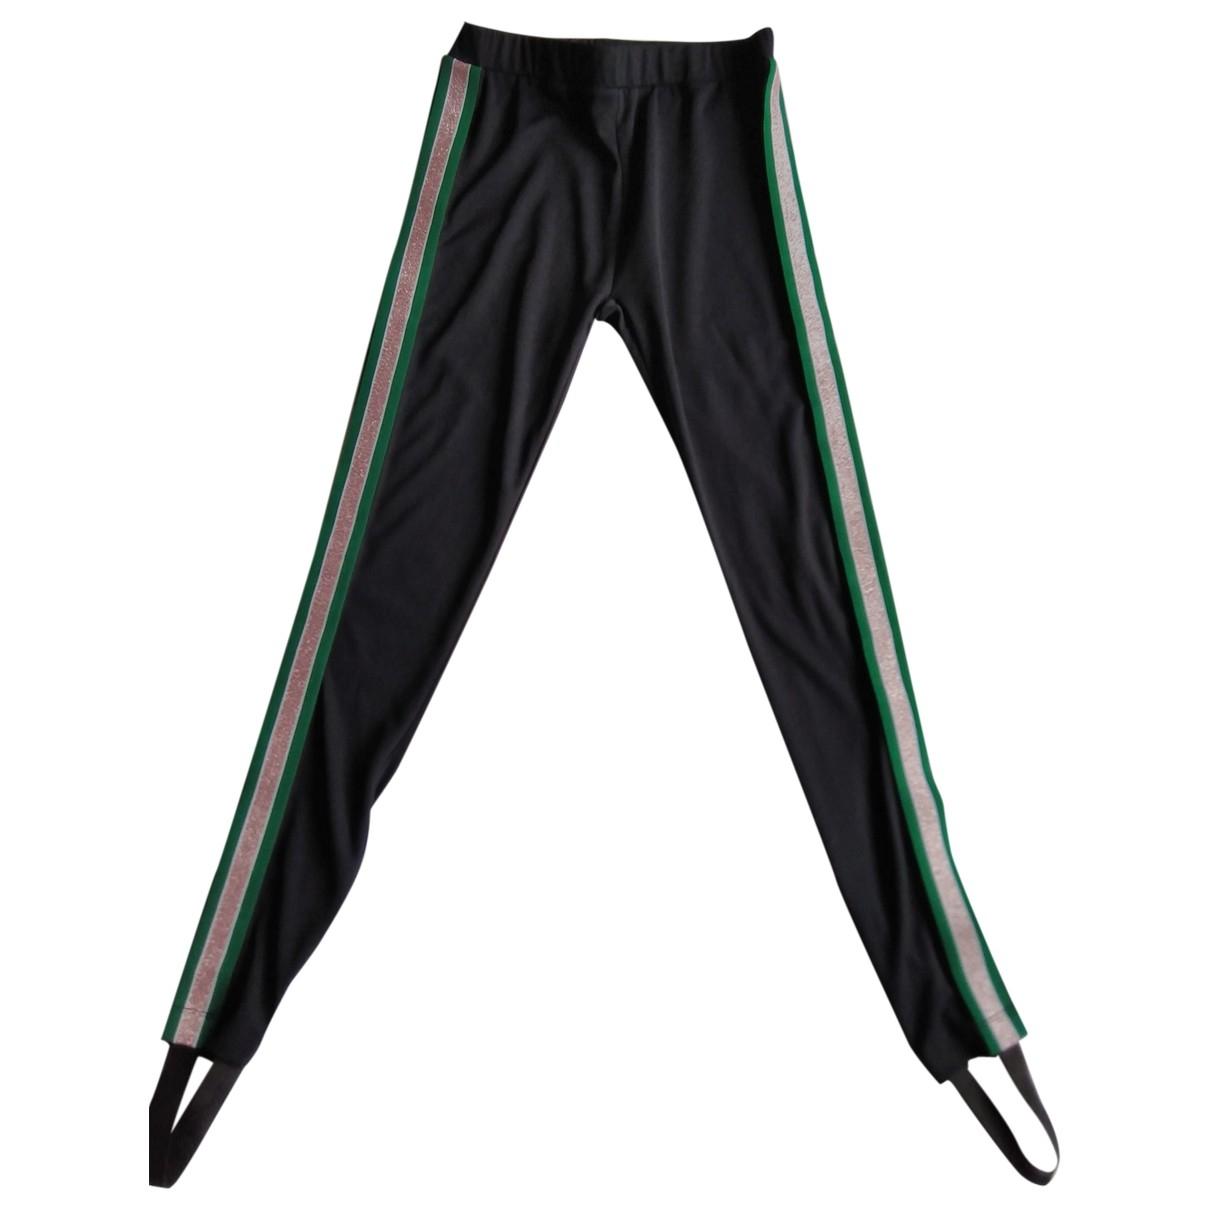 Beck Sonder Gaard \N Black Trousers for Women S International